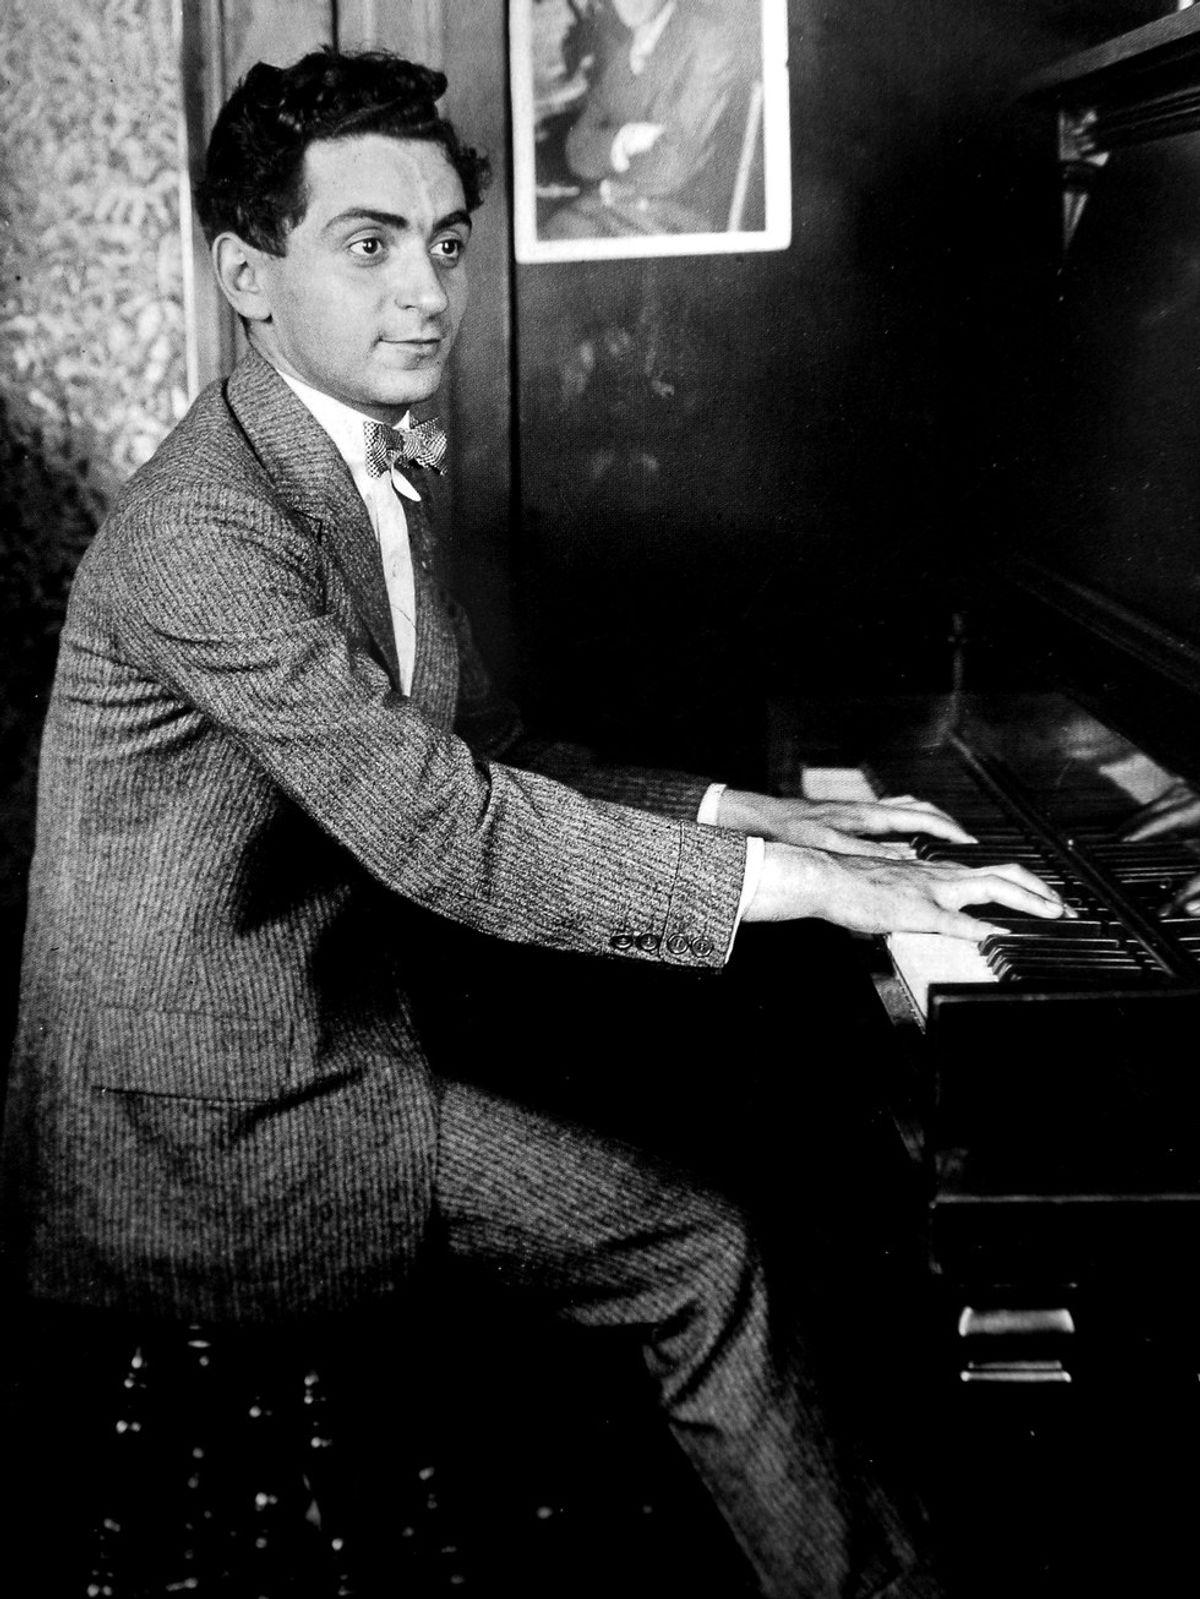 Irving Berlin: The American Schubert